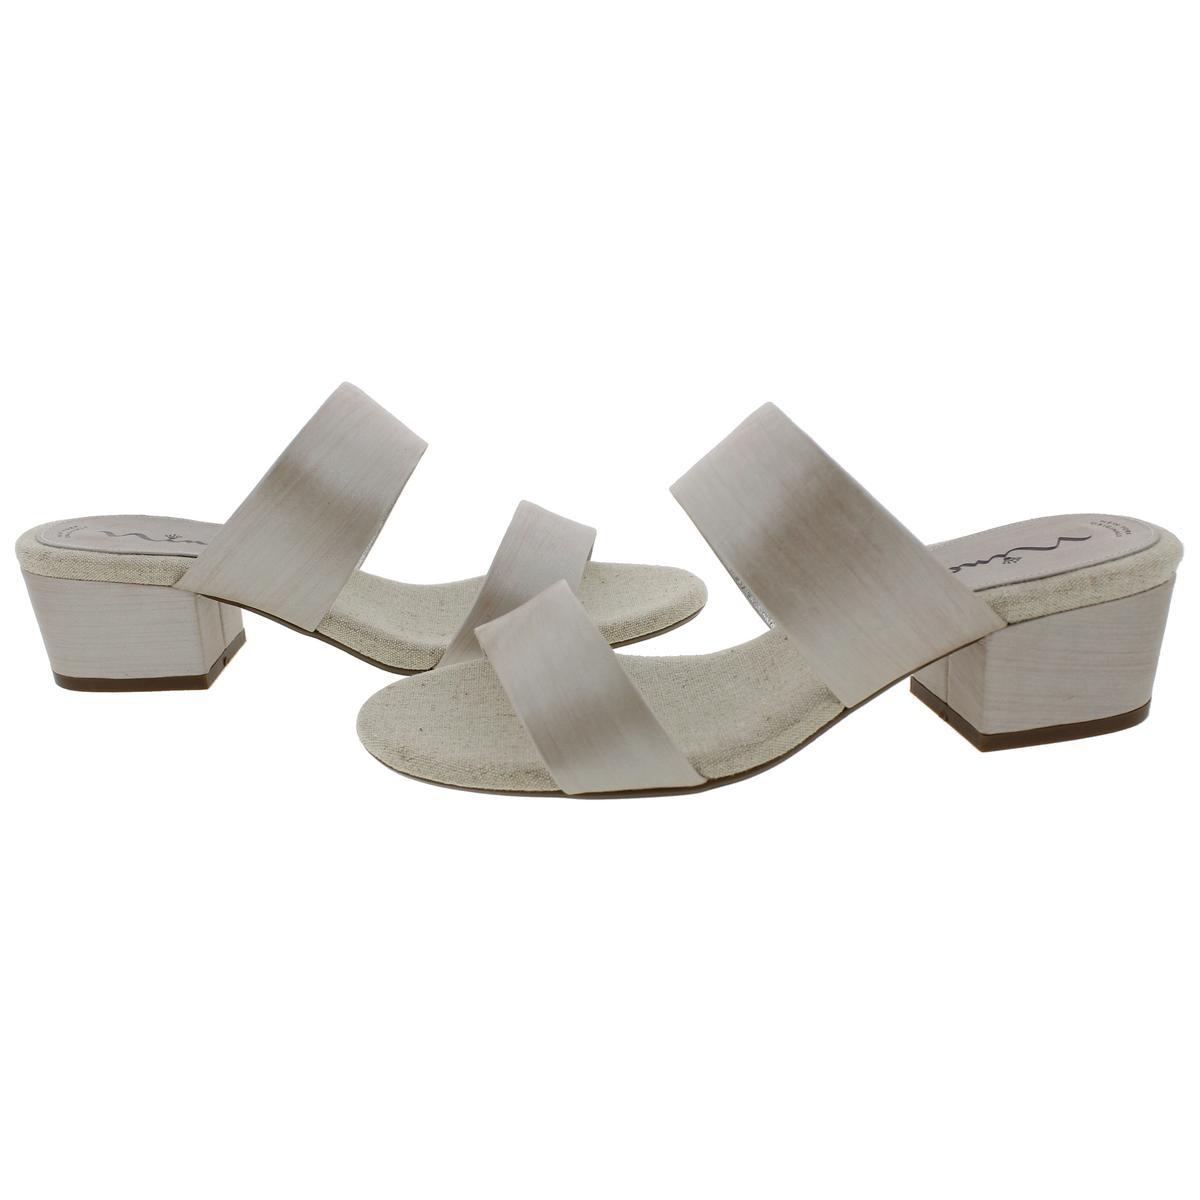 Nina-Womens-Vansi-Strappy-Block-Heel-Open-Toe-Heels-Sandals-BHFO-4278 thumbnail 6